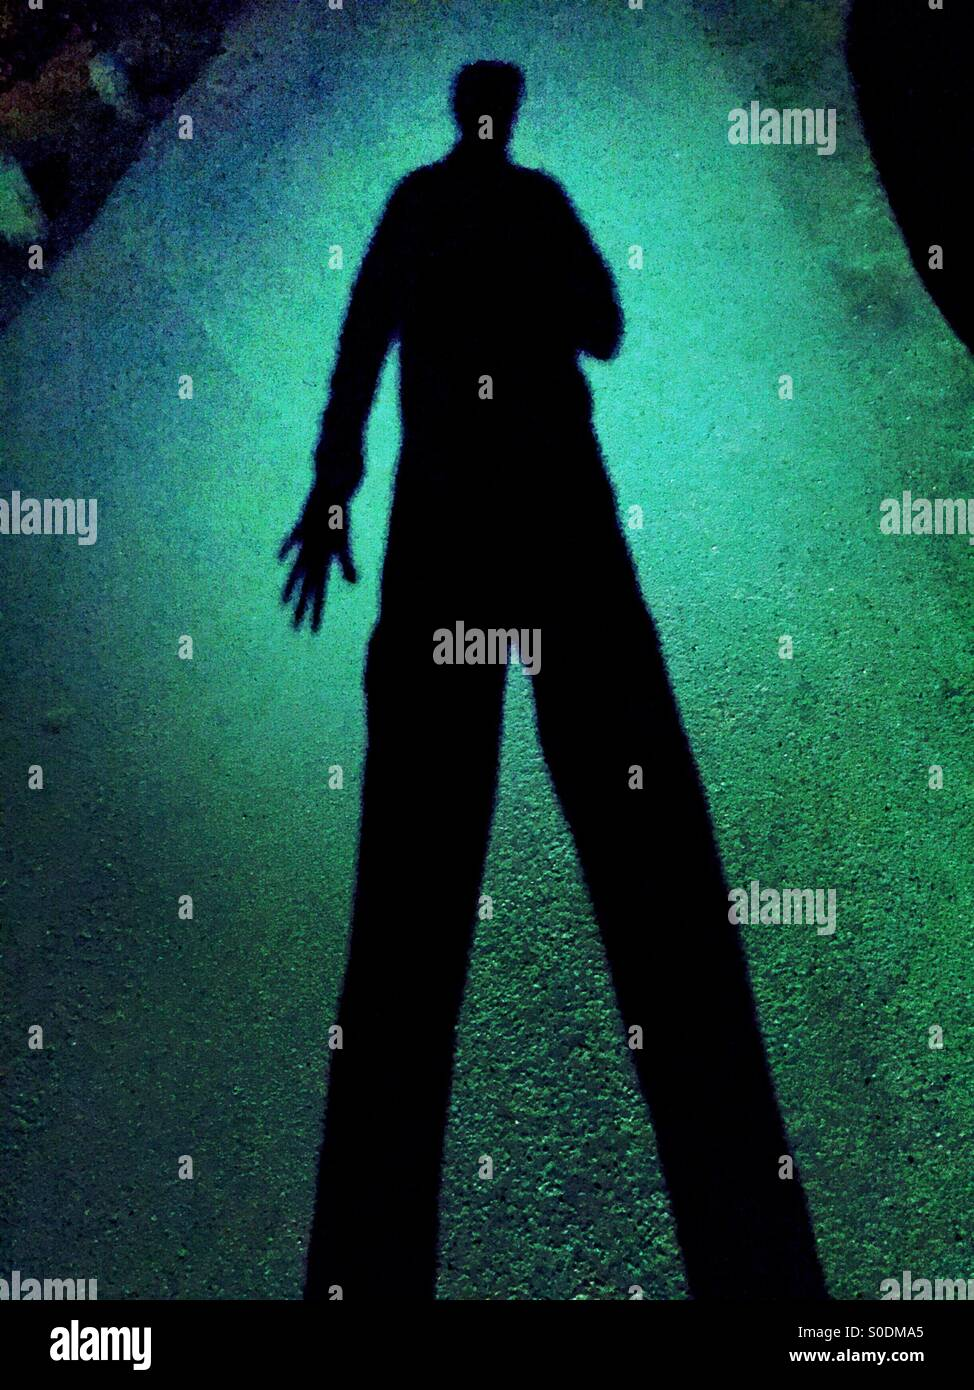 Triste sombra de un hombre armado Imagen De Stock